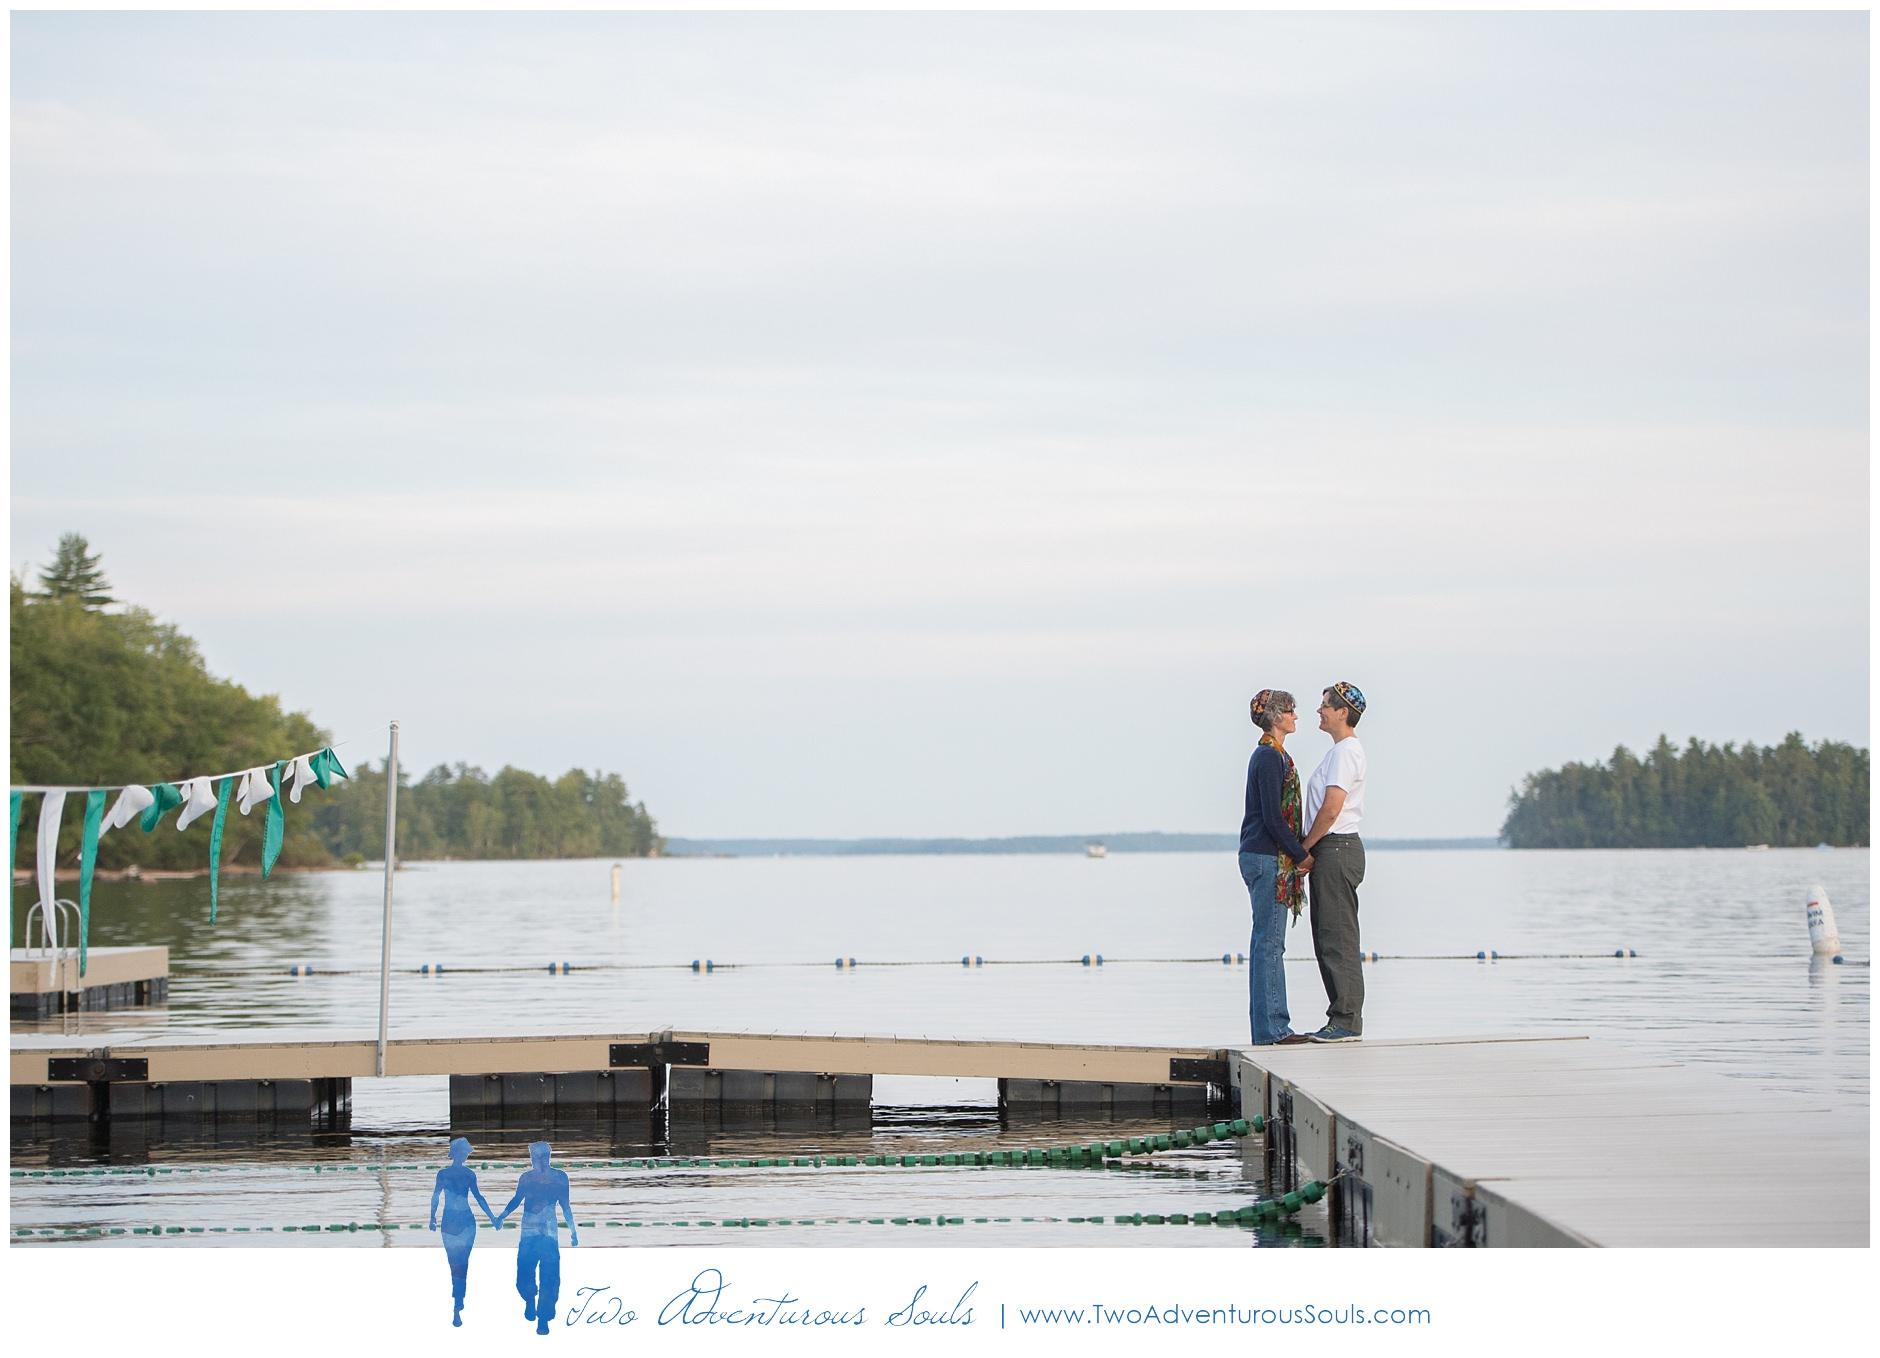 090217-Mindy-Karen-sneaks-78_WEB-Maine-Wedding-and-Portrait-Photographer.jpg